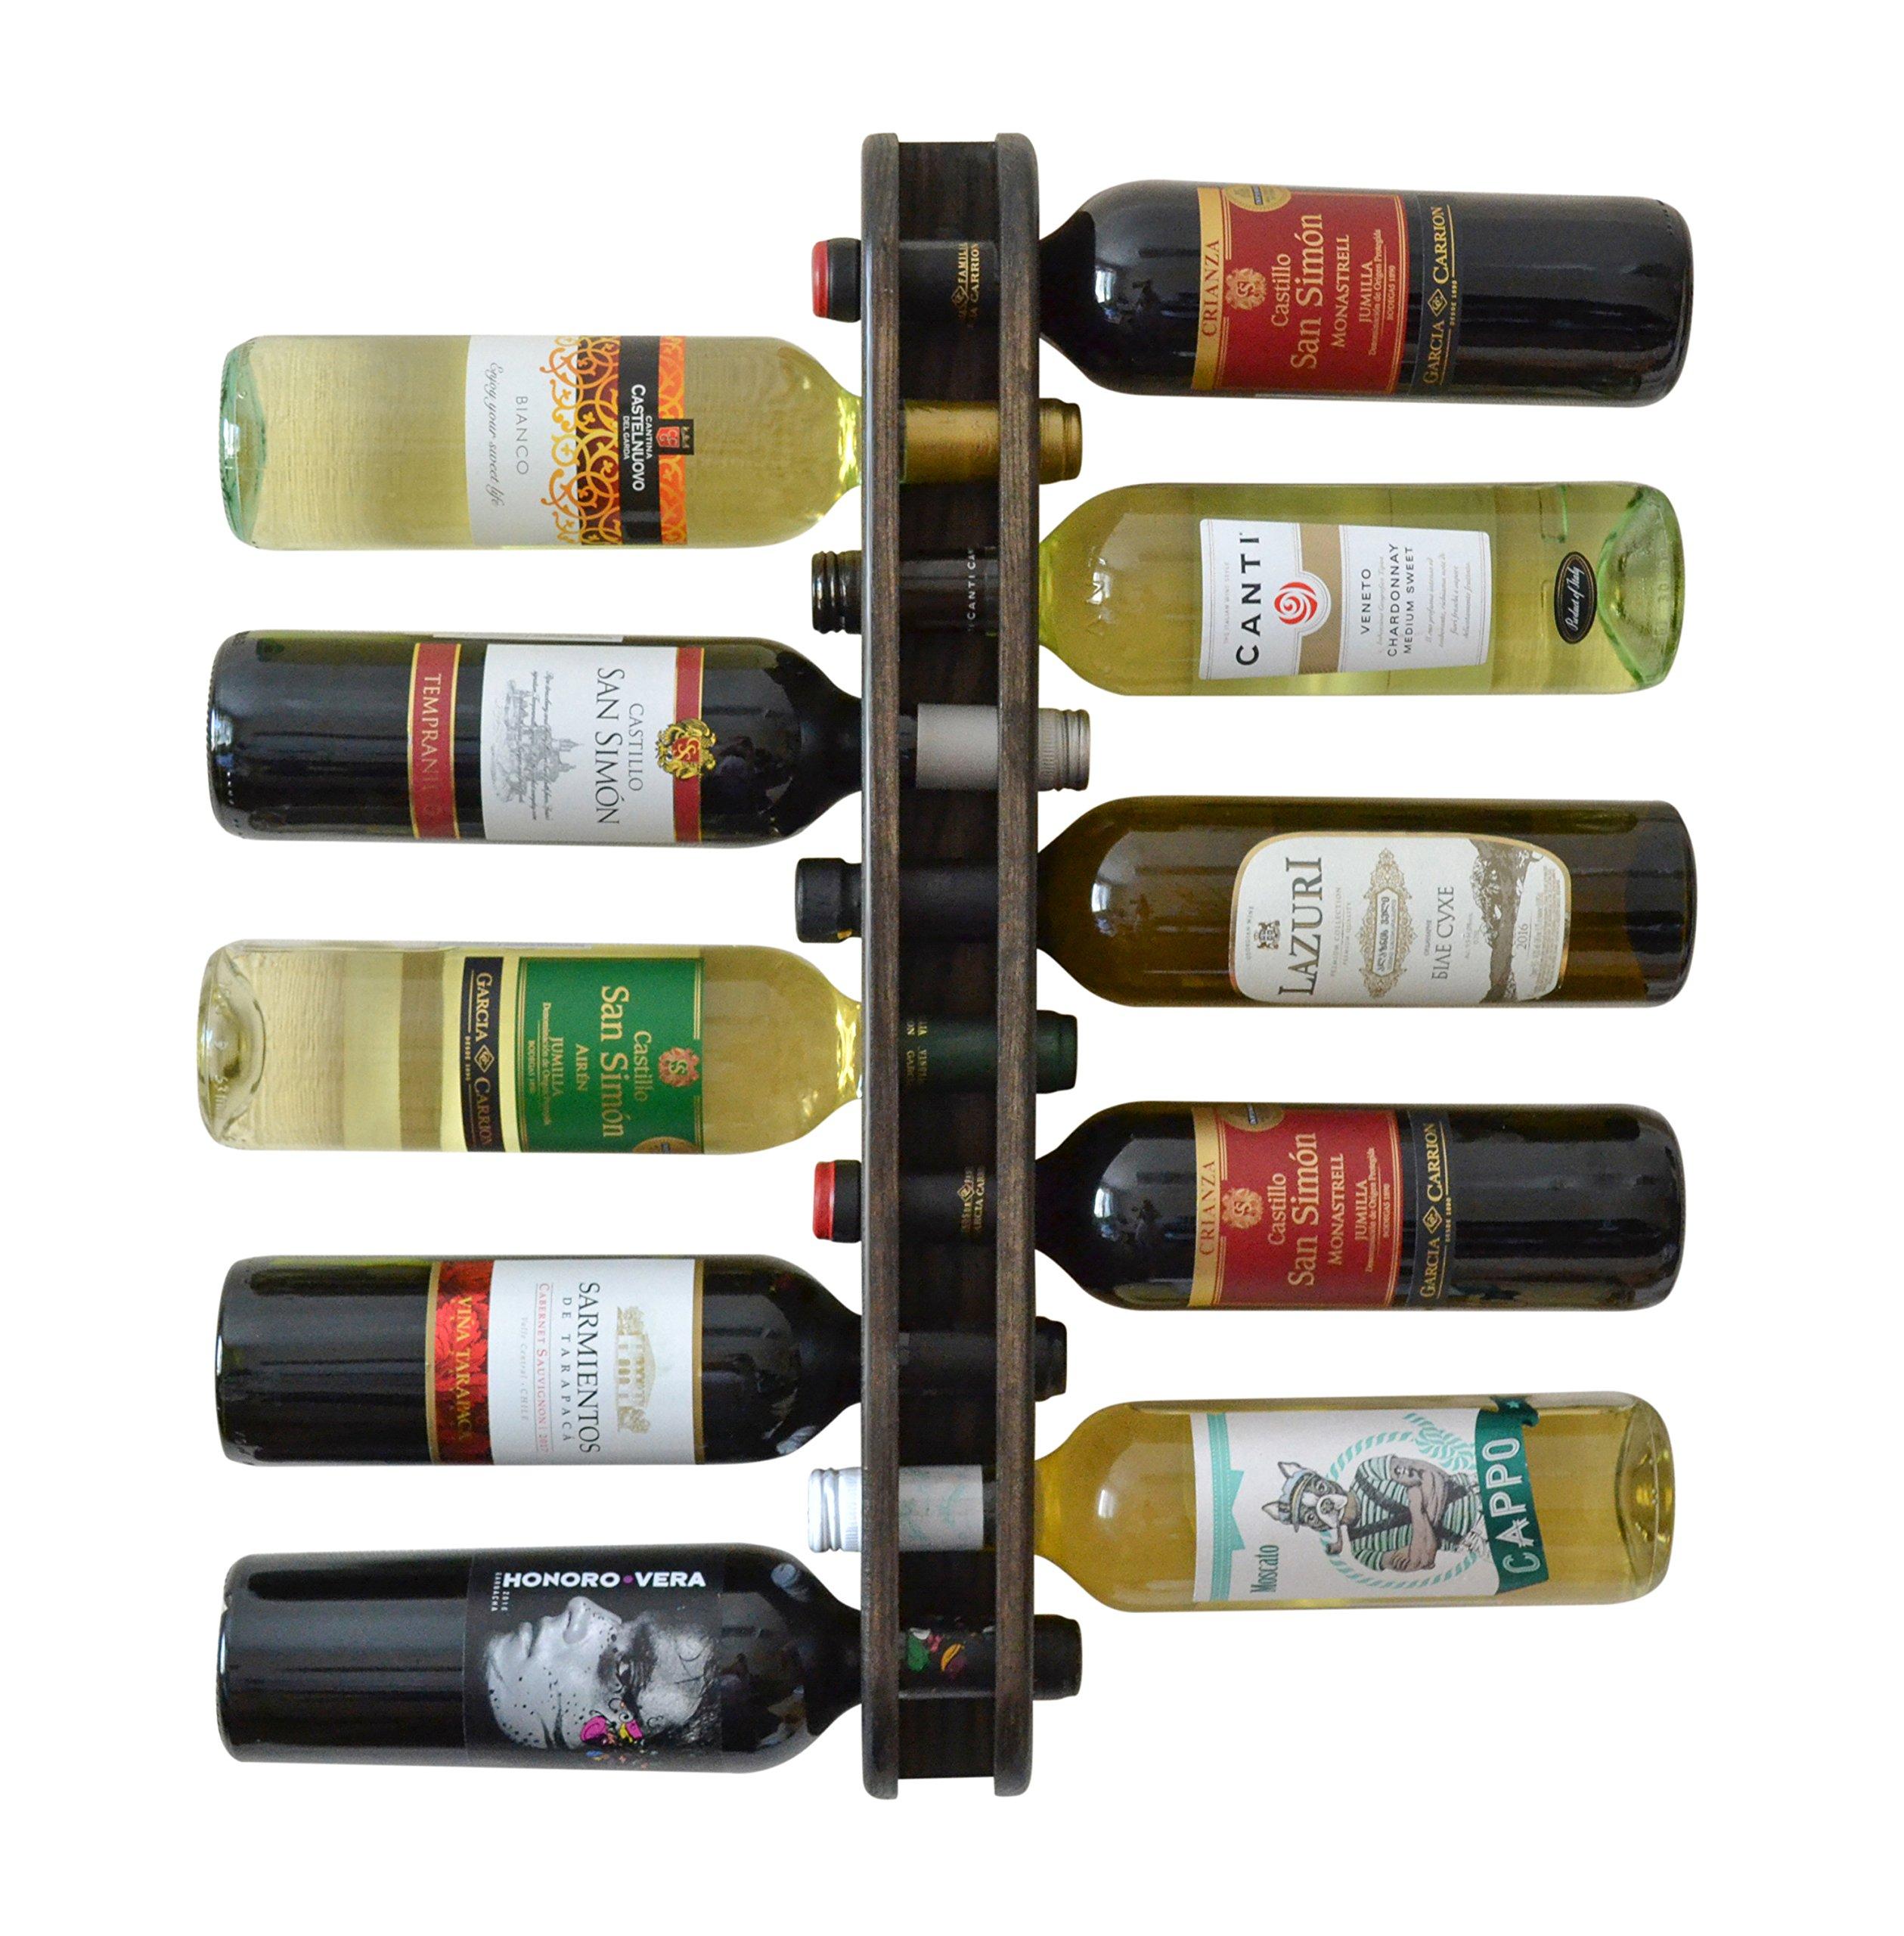 MyFancyCraft Handmade Wood Wine Rack Natural Pine Decor 10 Bottle Double Holder Organizer Wall Mounted